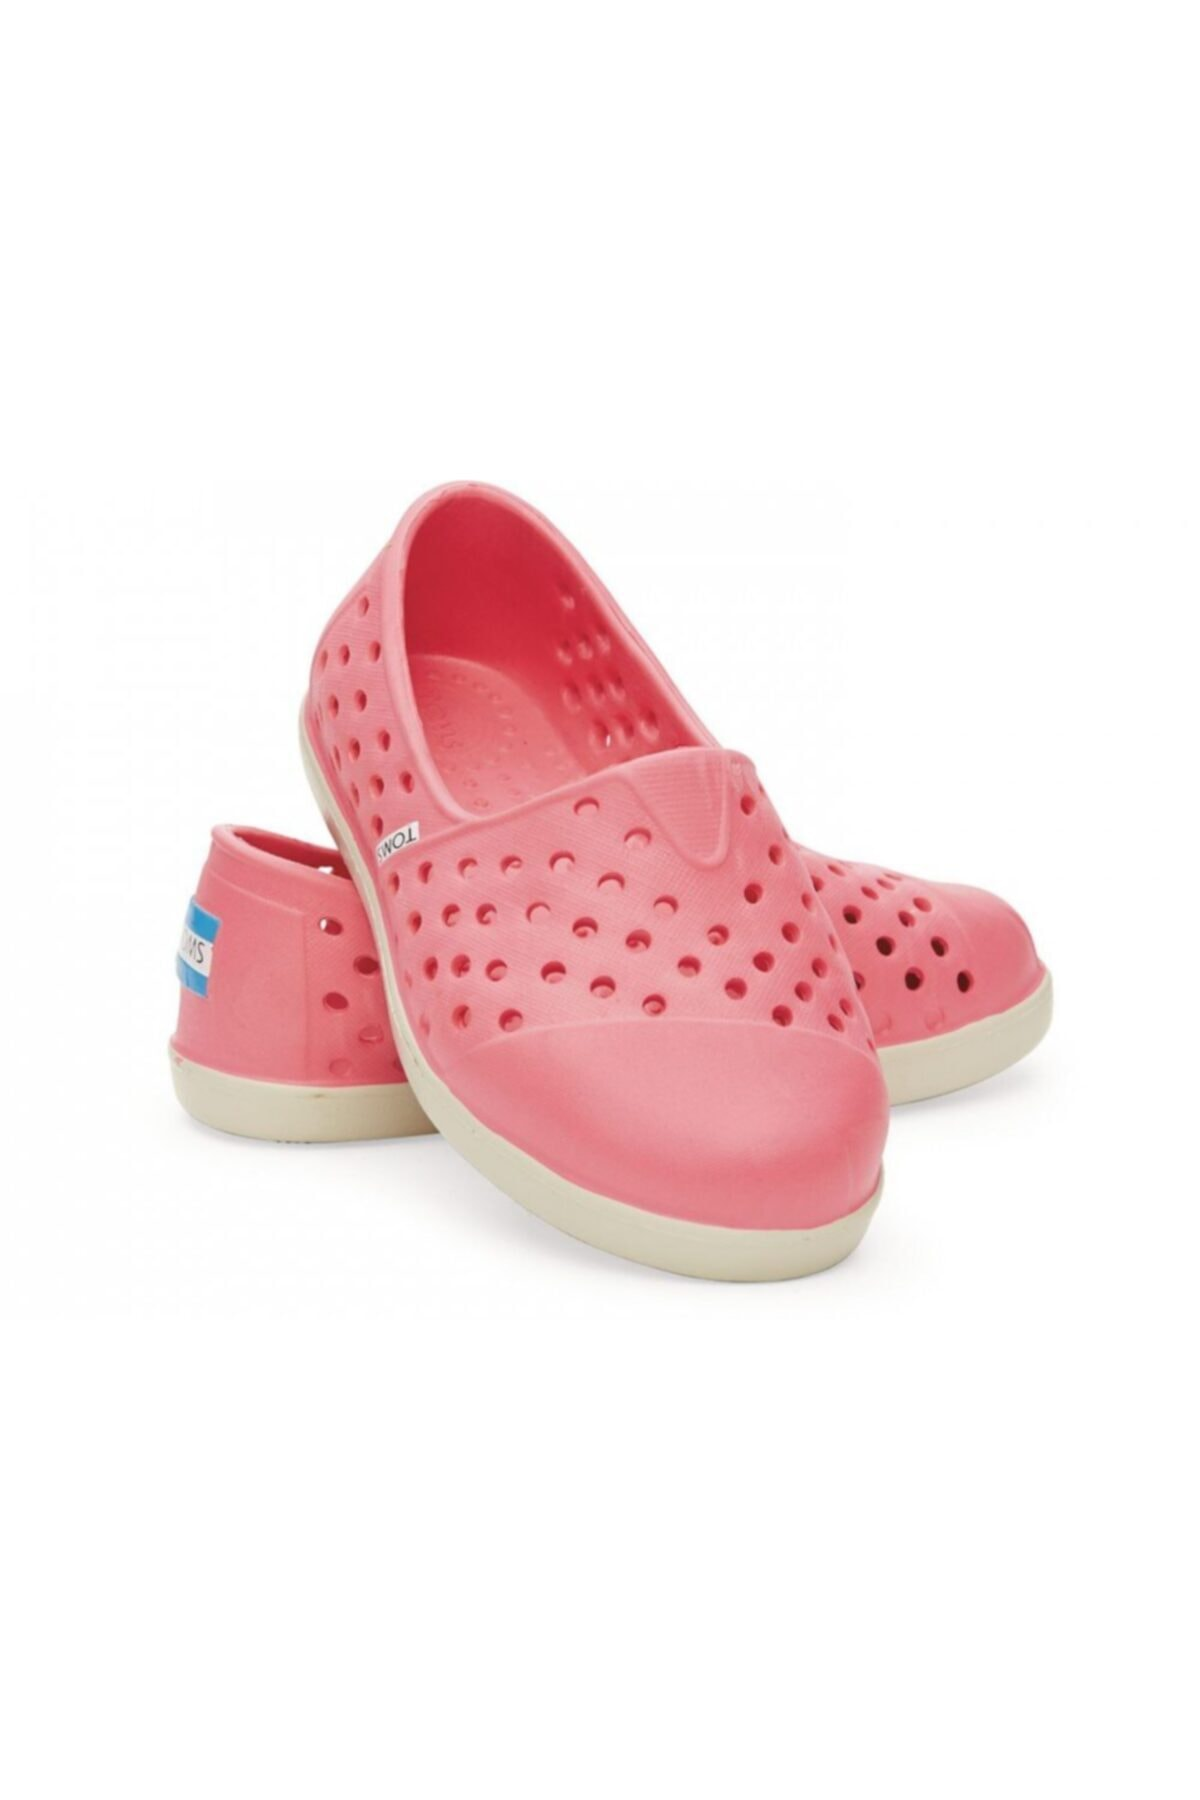 Toms Deniz Terliği Romper Pink 2